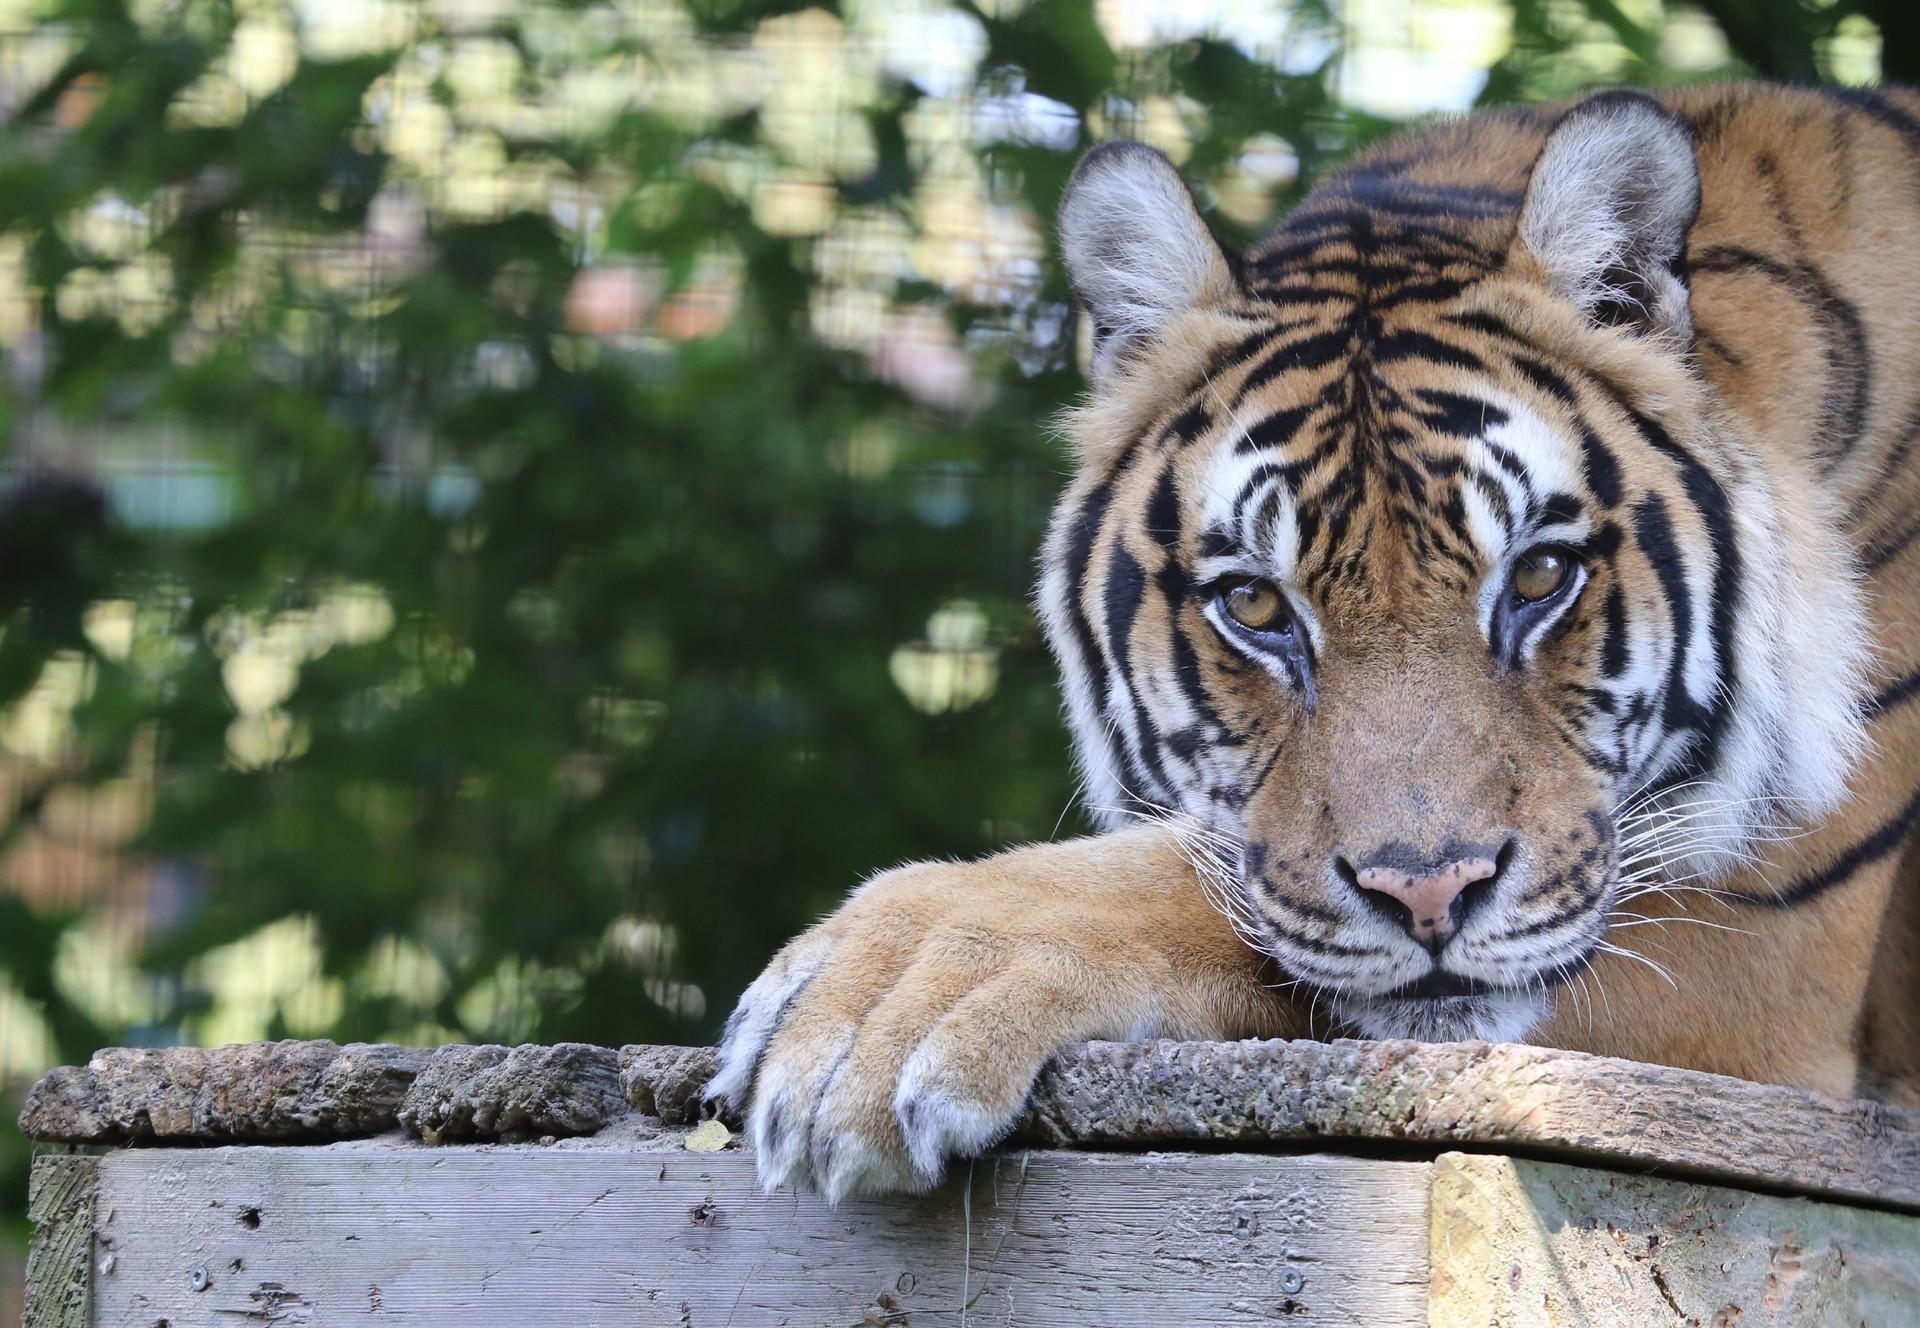 Tiger Rajah